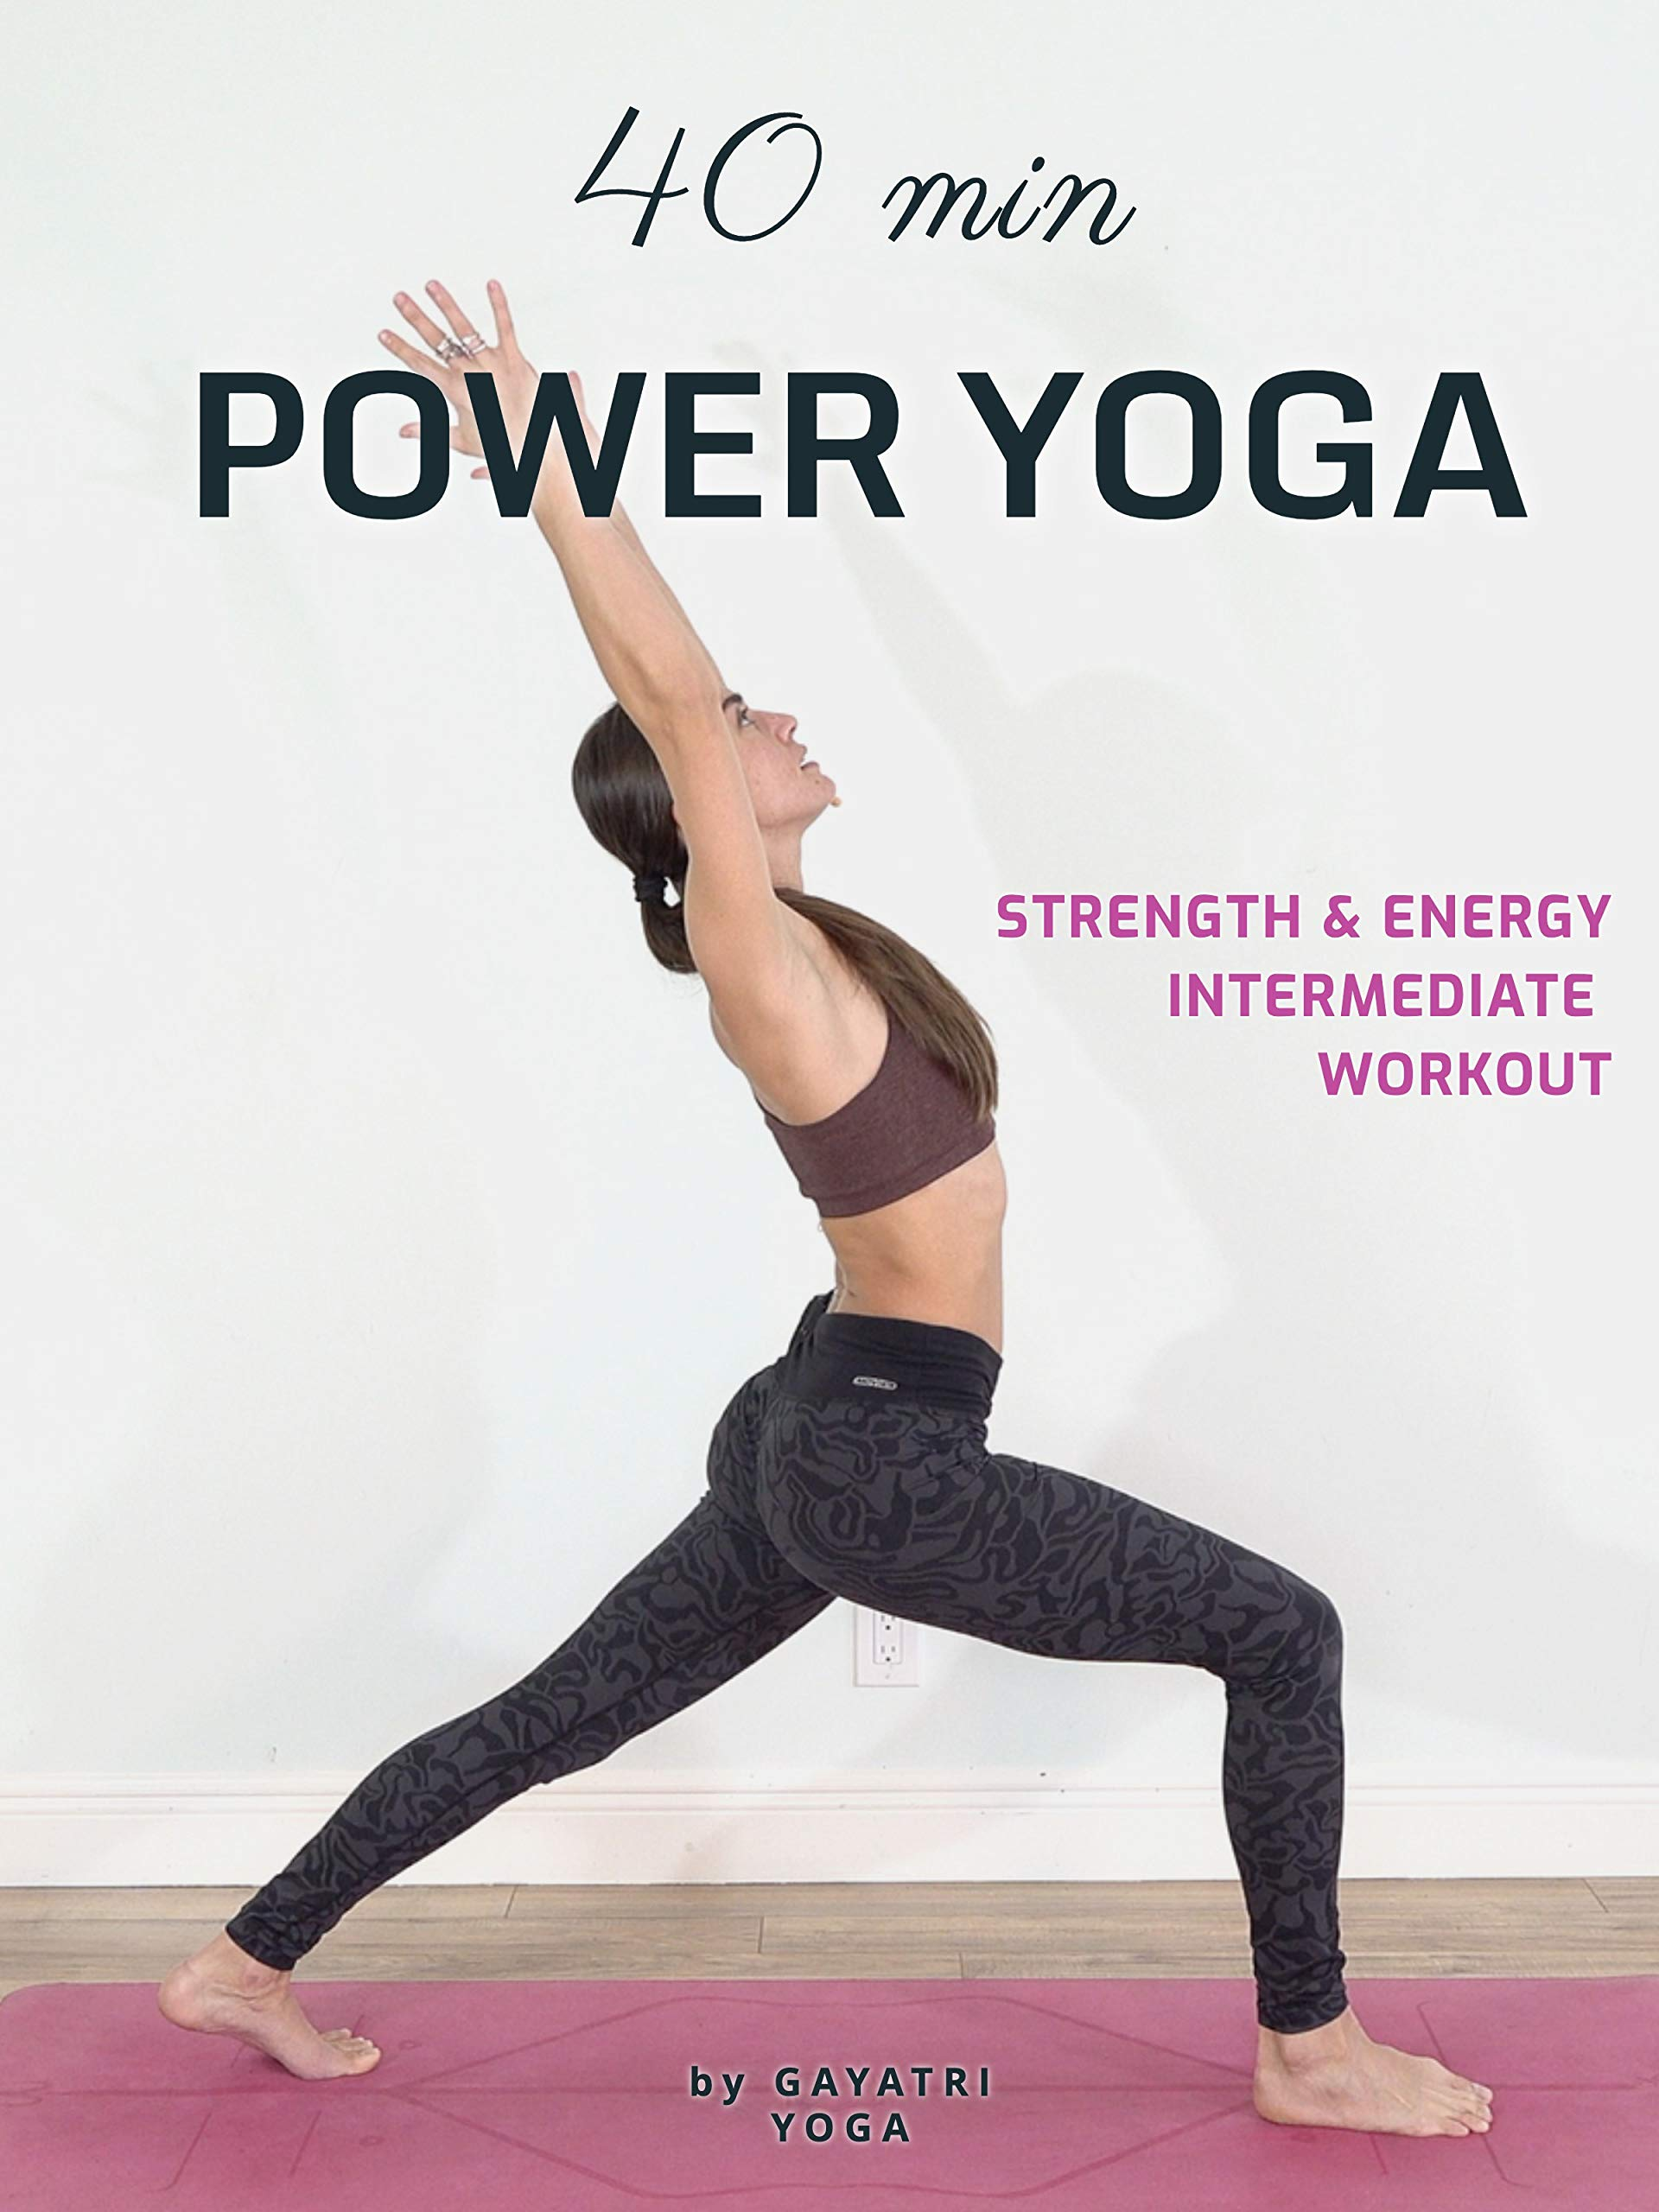 40 Min Power Yoga - Strength & Energy Intermediate Workout - Gayatri Yoga